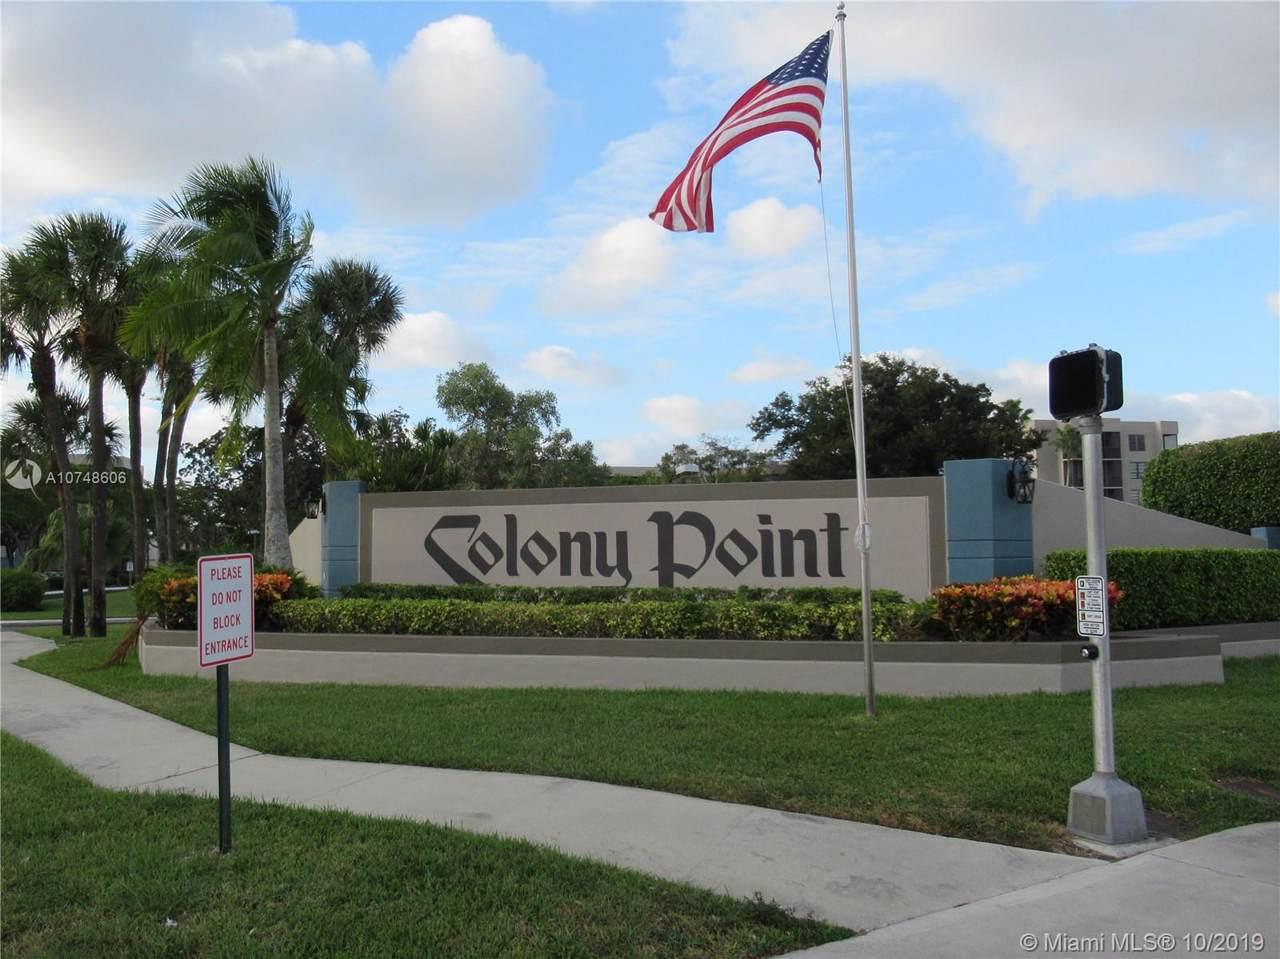 1101 Colony Point Cir - Photo 1